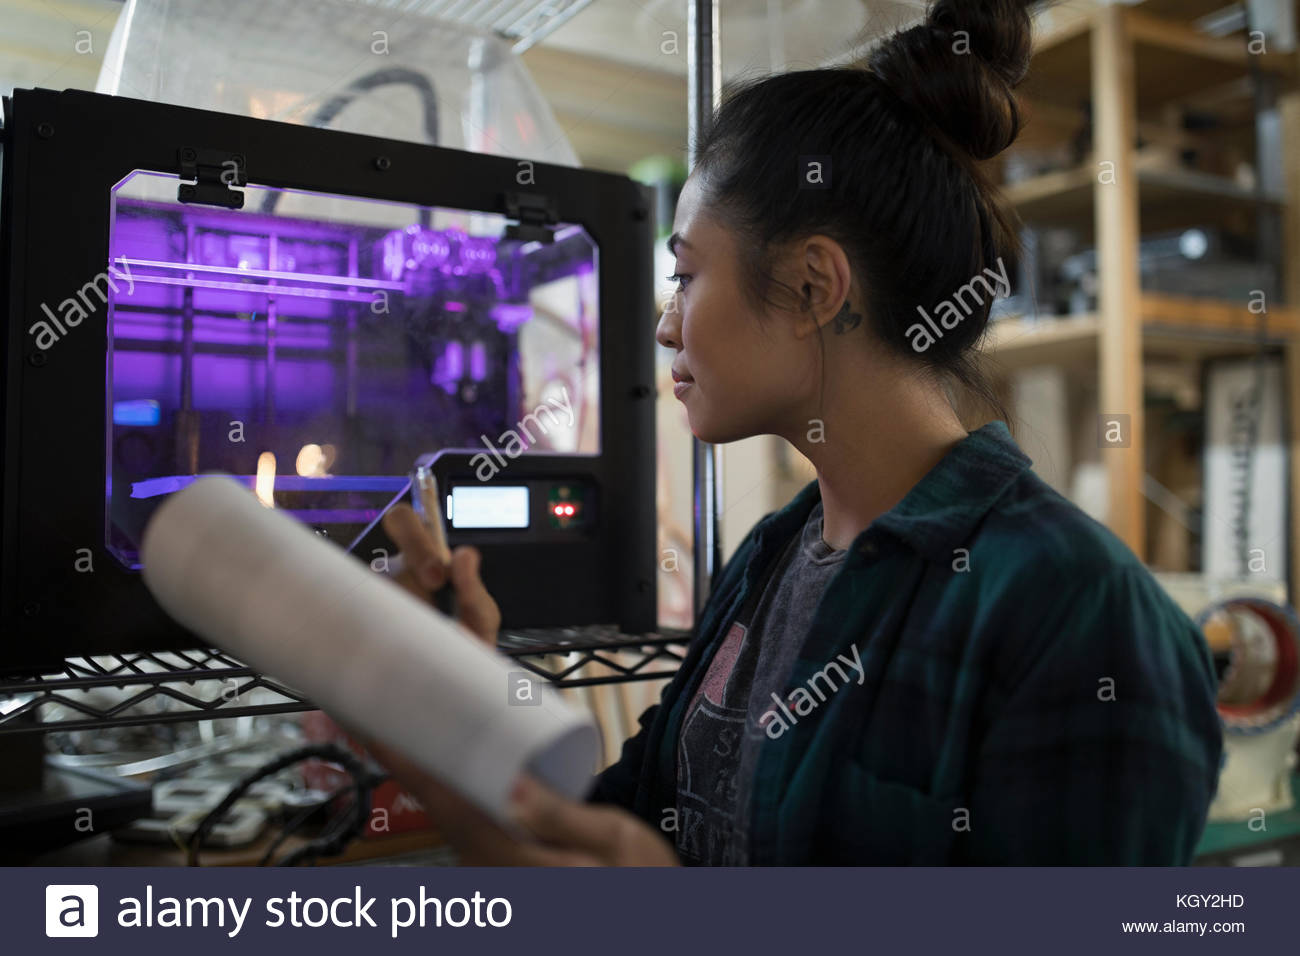 Diseñador femenino mediante impresora 3D en el taller Imagen De Stock